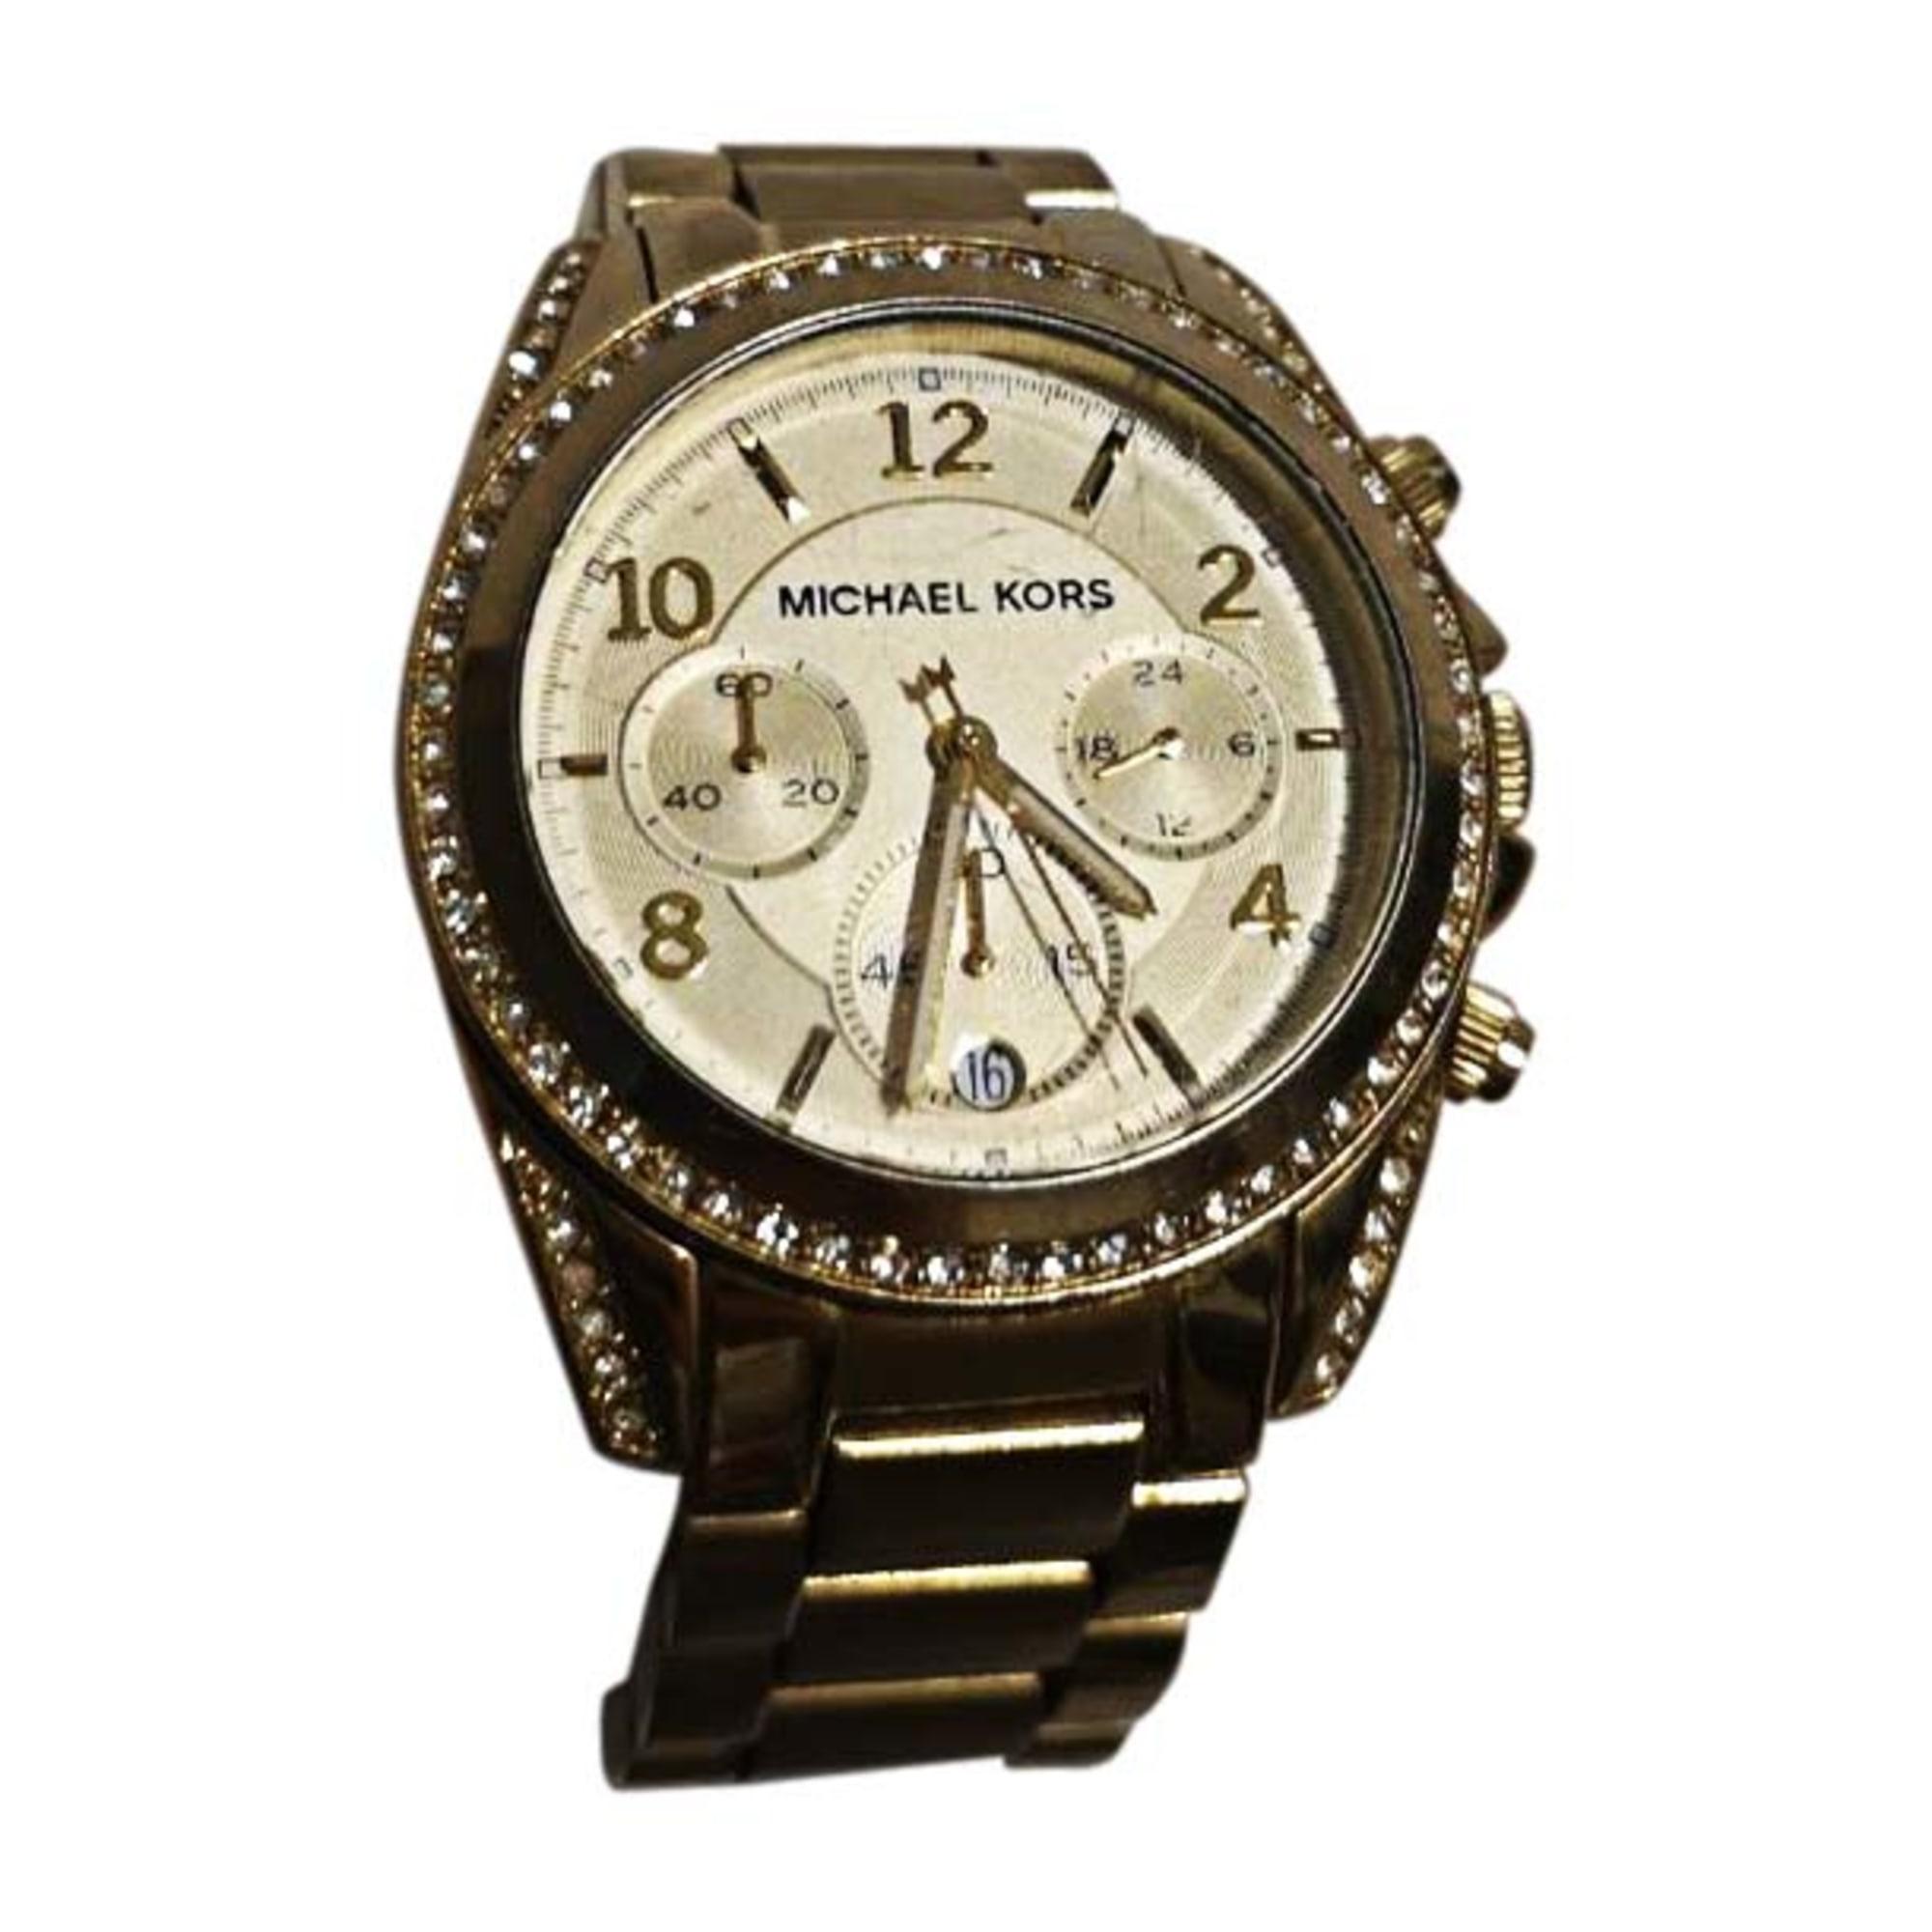 Wrist Watch MICHAEL KORS Golden, bronze, copper